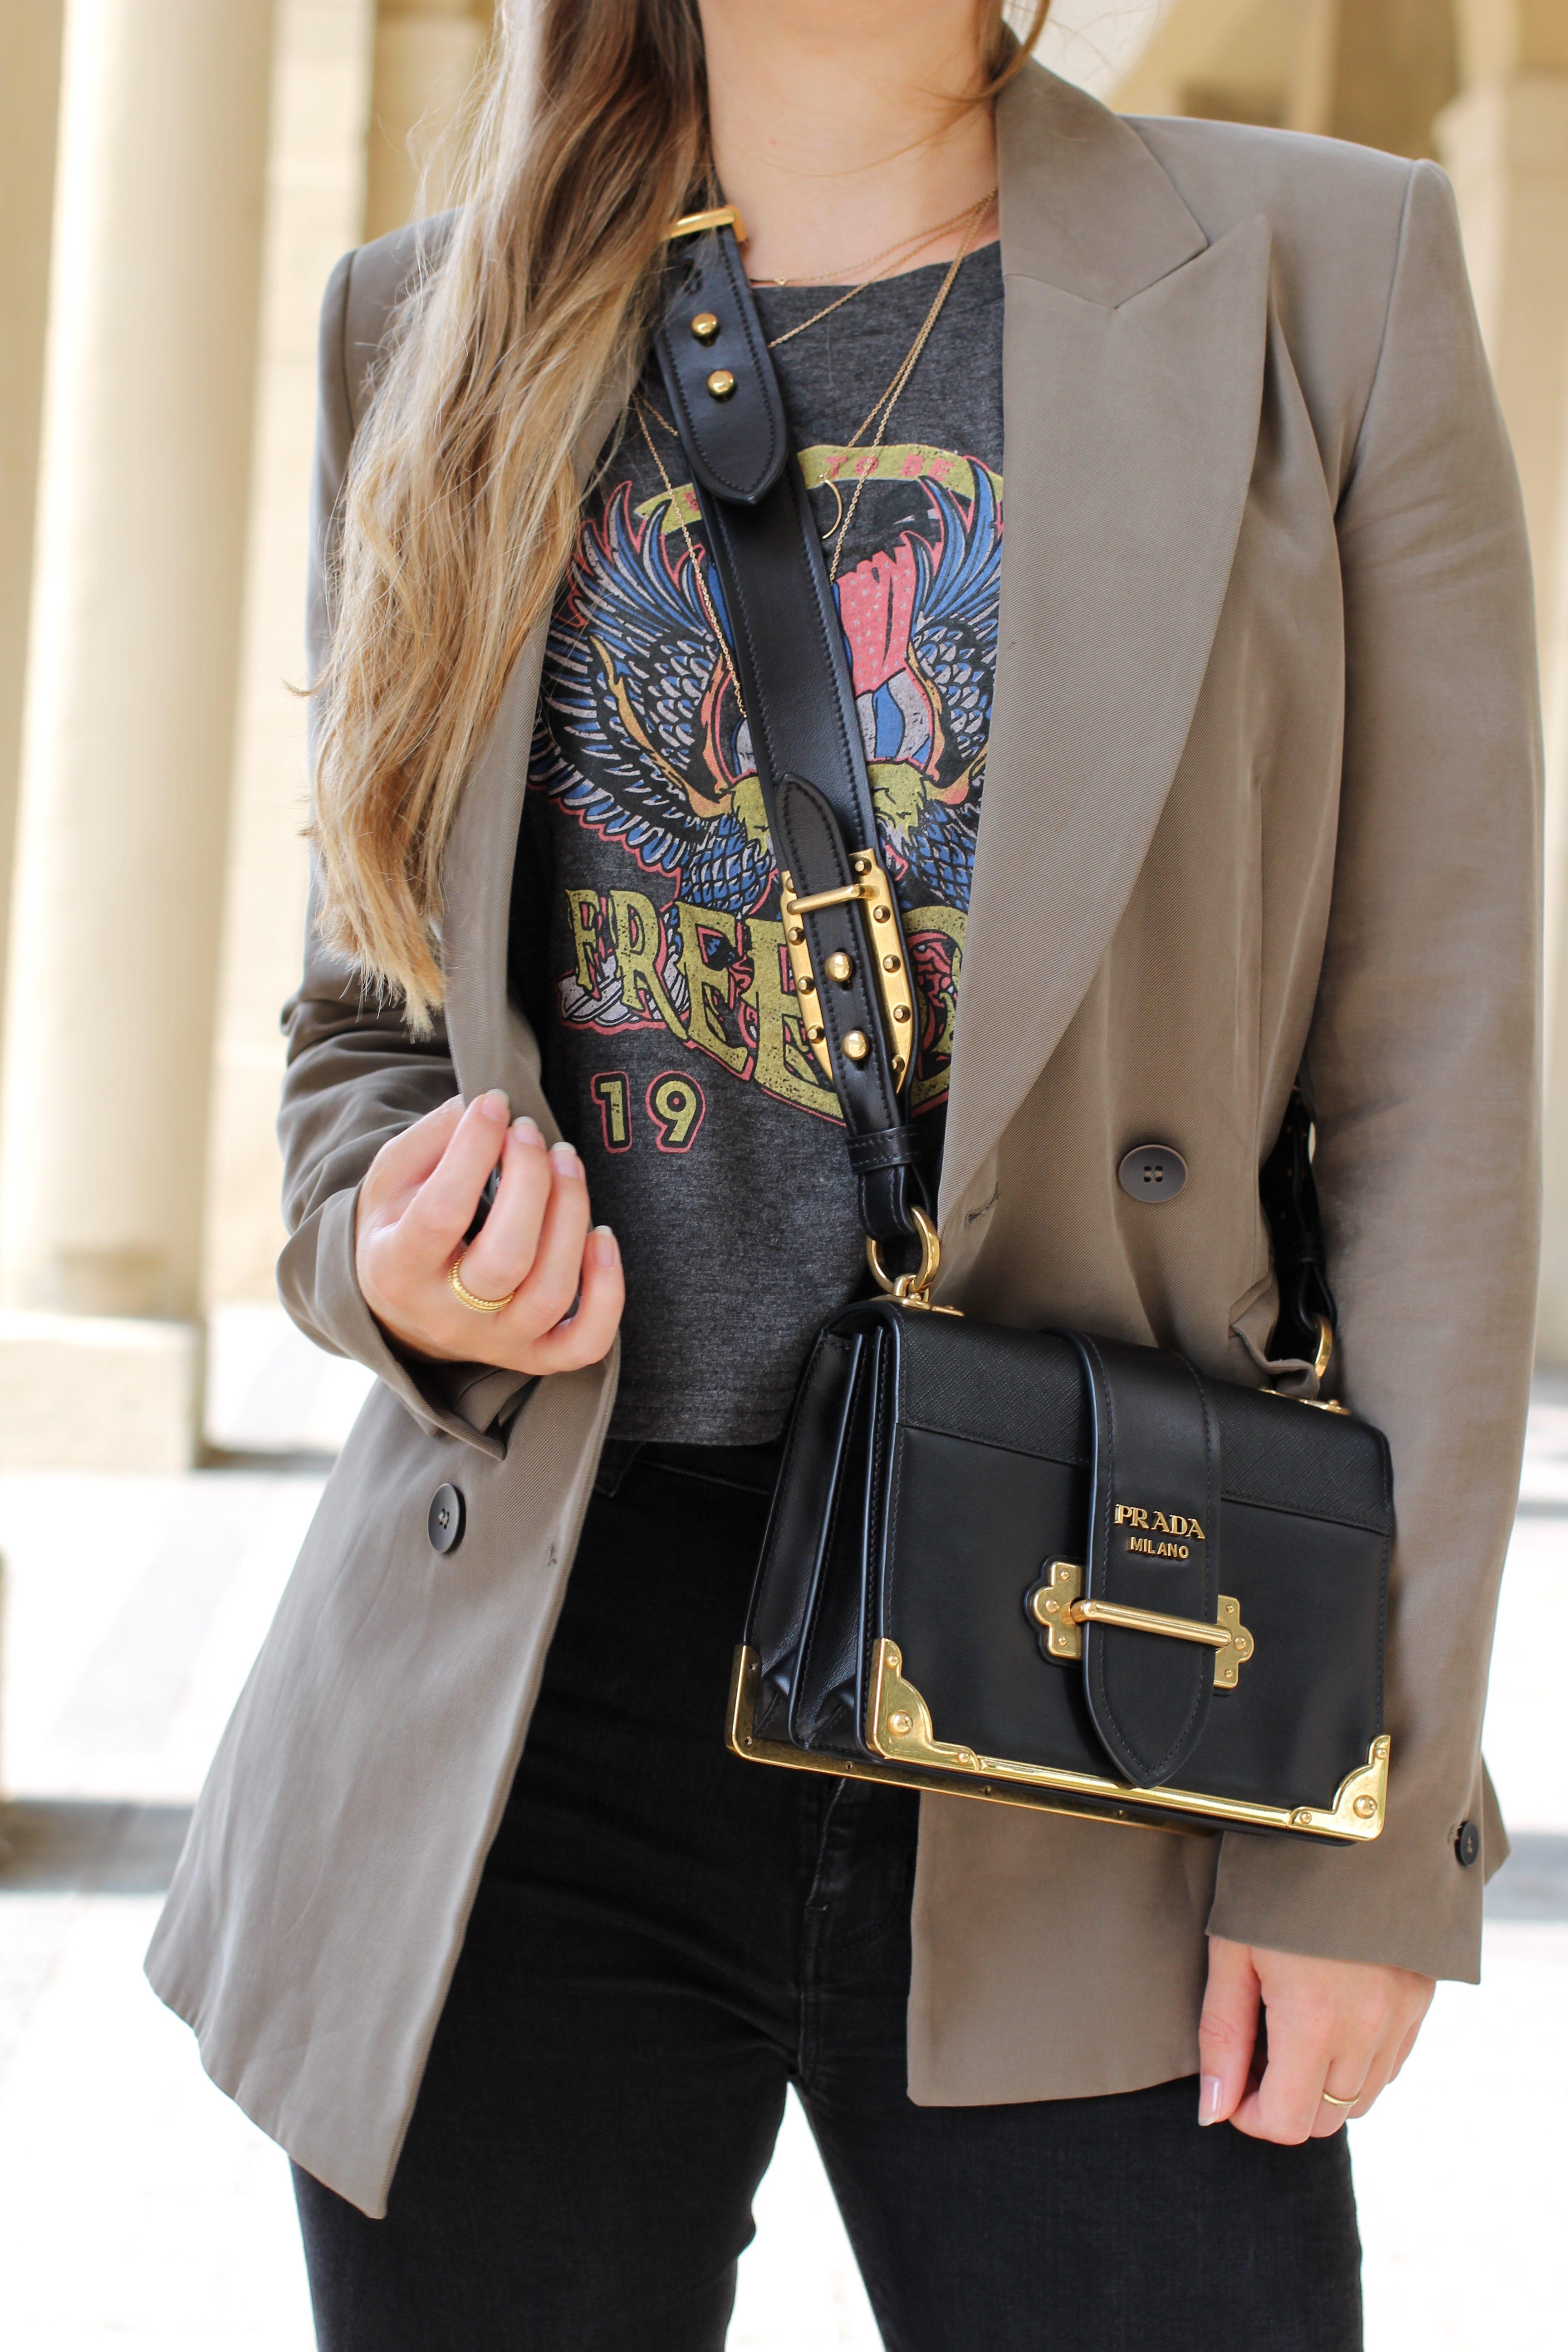 Highwaist Jeans Crop Top Print kombinieren Lieblings-Blazer Zara Blazer Navy Grün Prada Cahier Bag Frühlingslook Outfit Modeblog Karlsruhe 5